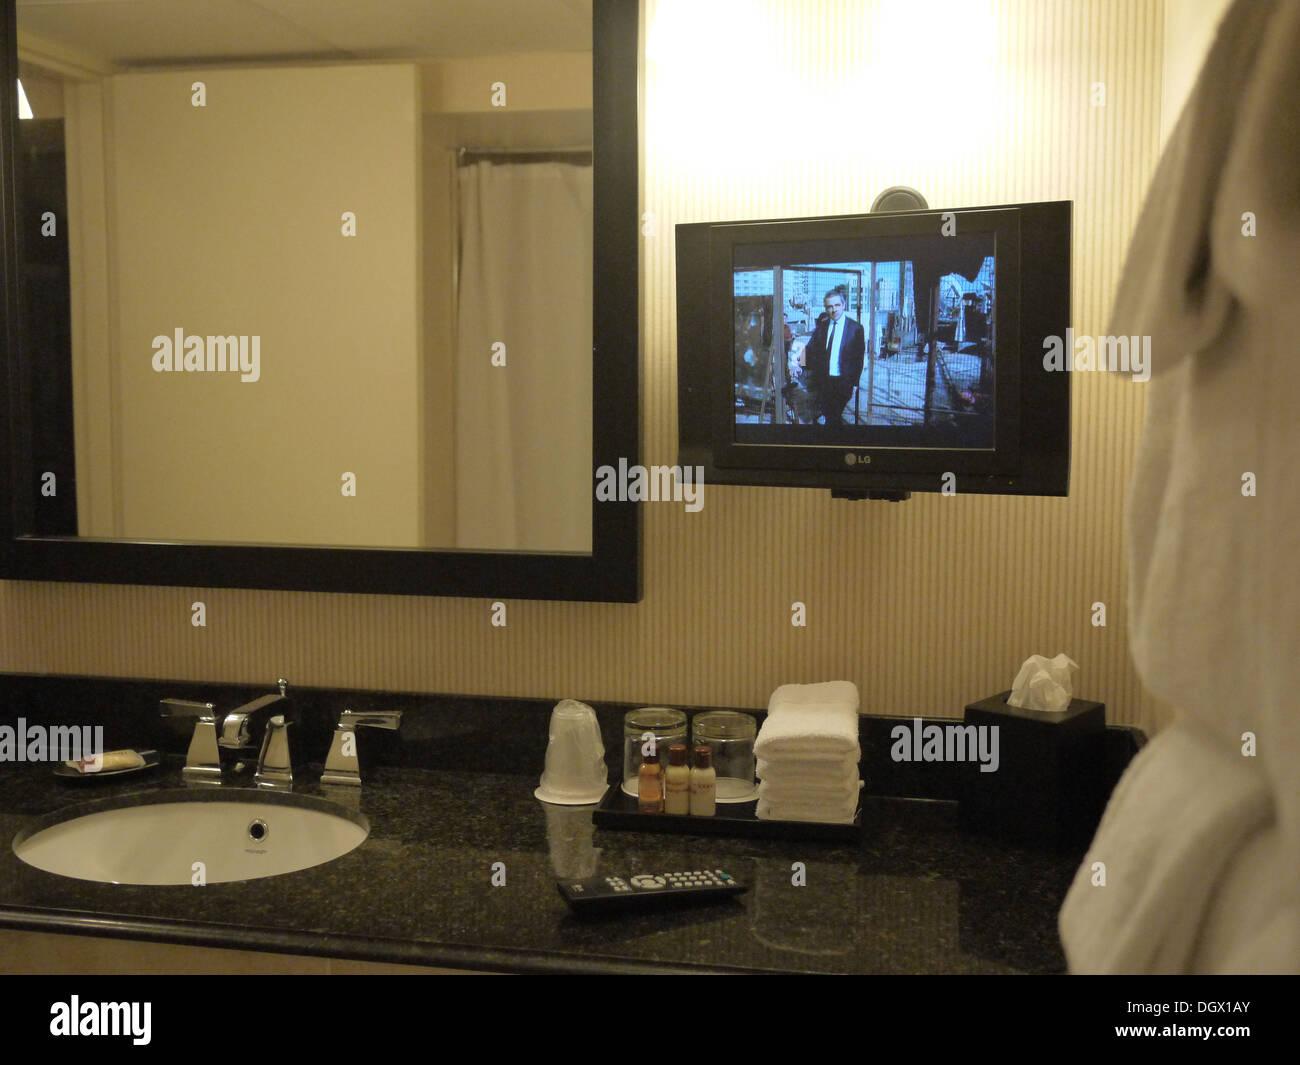 vor dem Fernseher im Badezimmer sheraton hotel Stockfoto ...